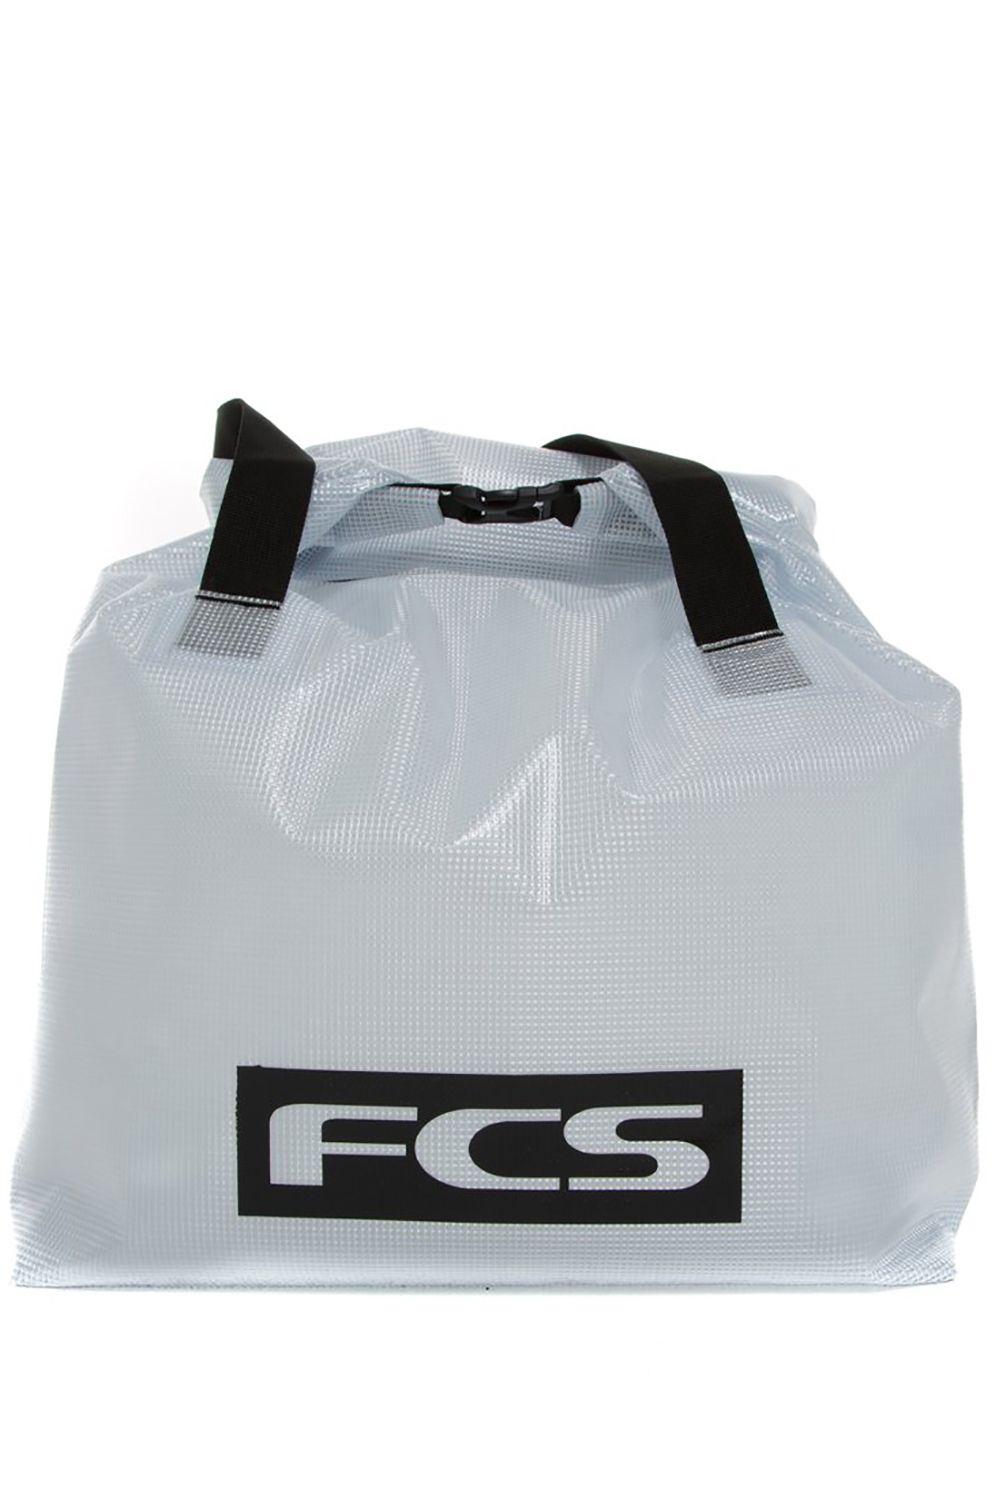 Fcs Purse WET BAG Clear